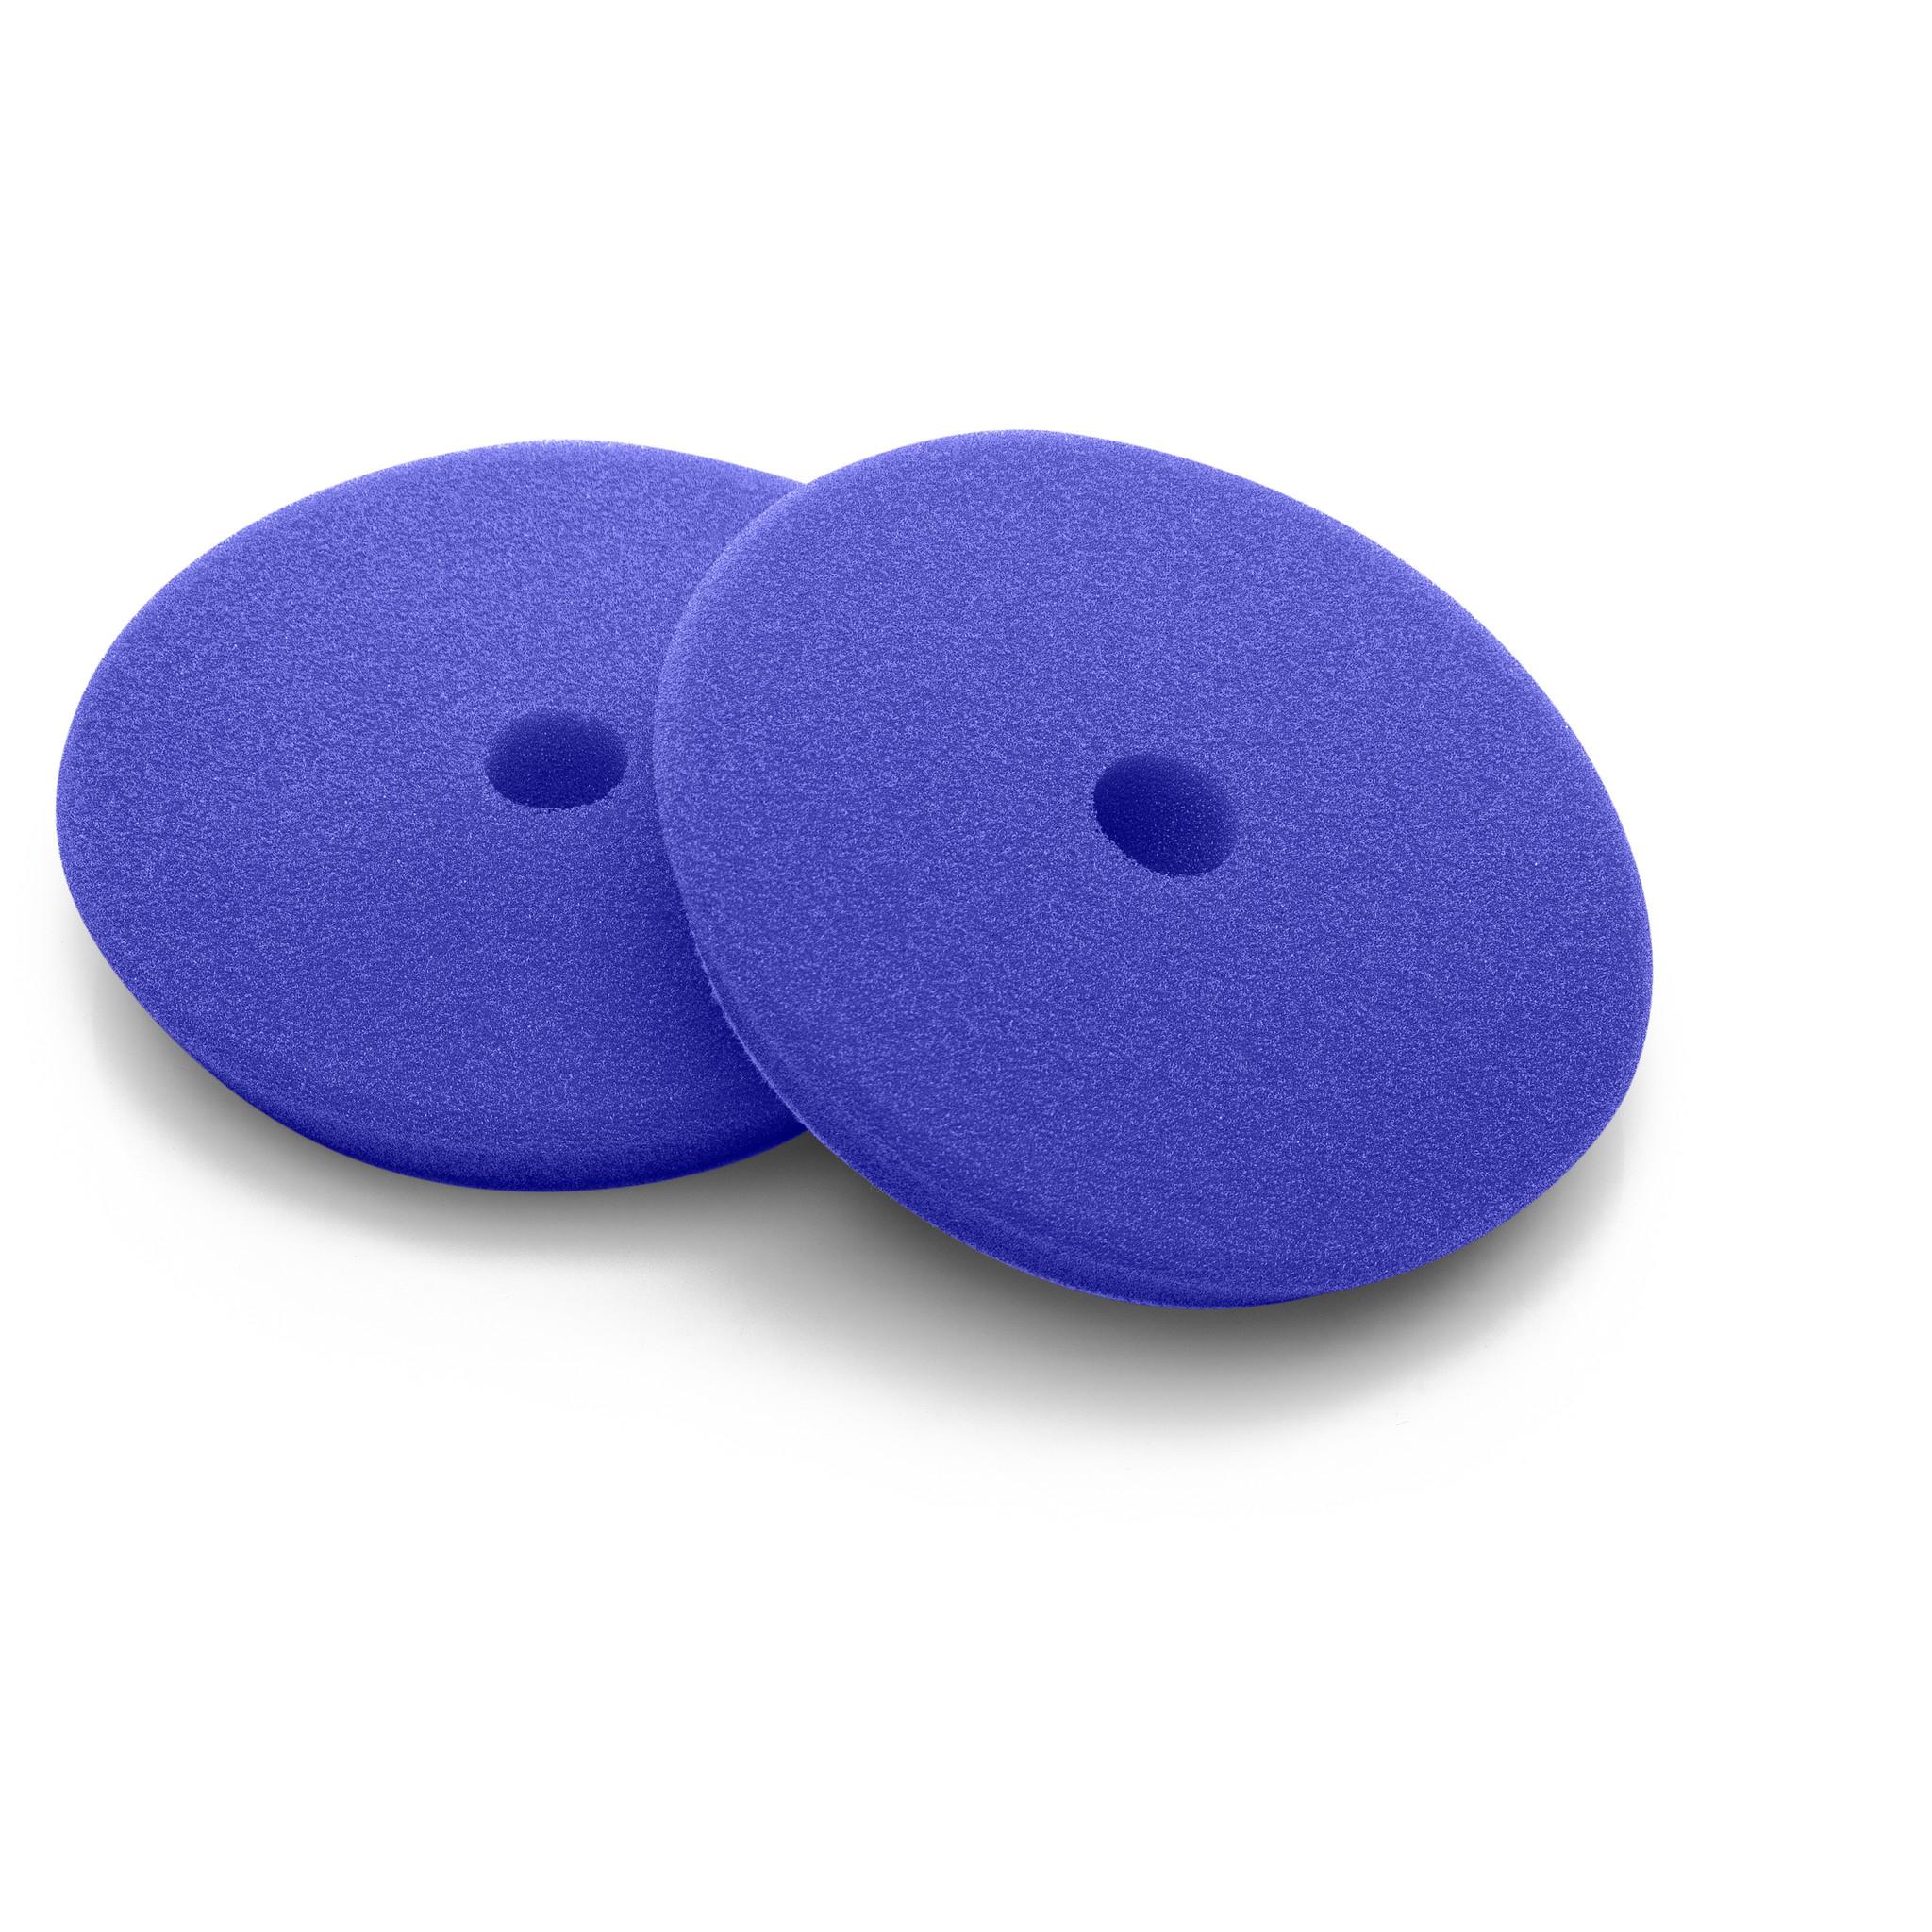 Ewocar Ewocar Hart Pad Blau 150mm